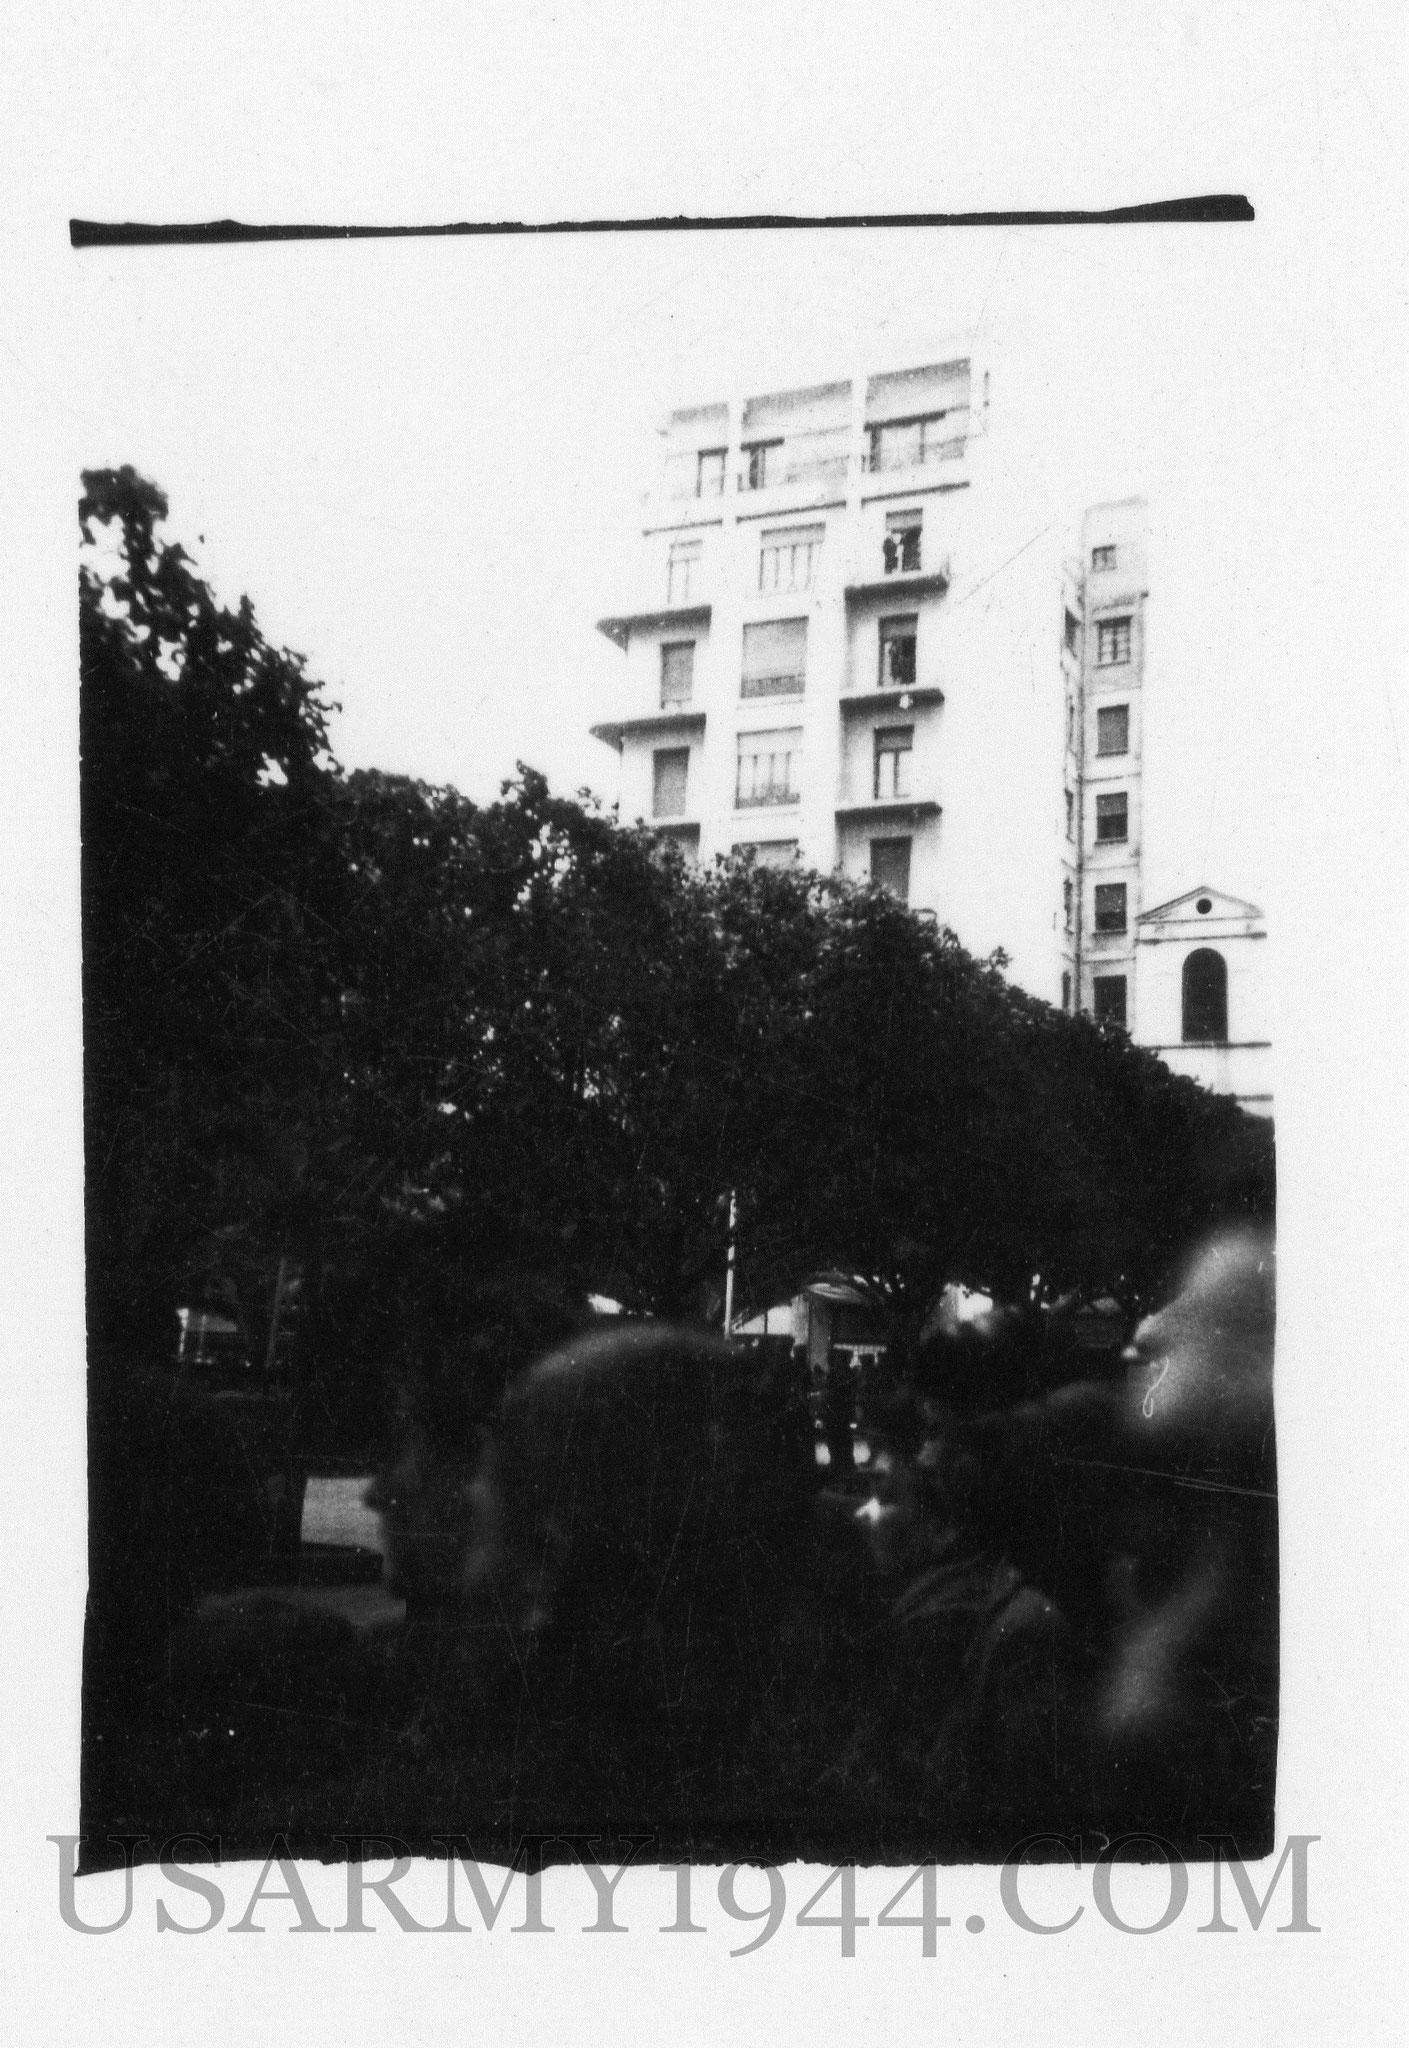 Oran 1943